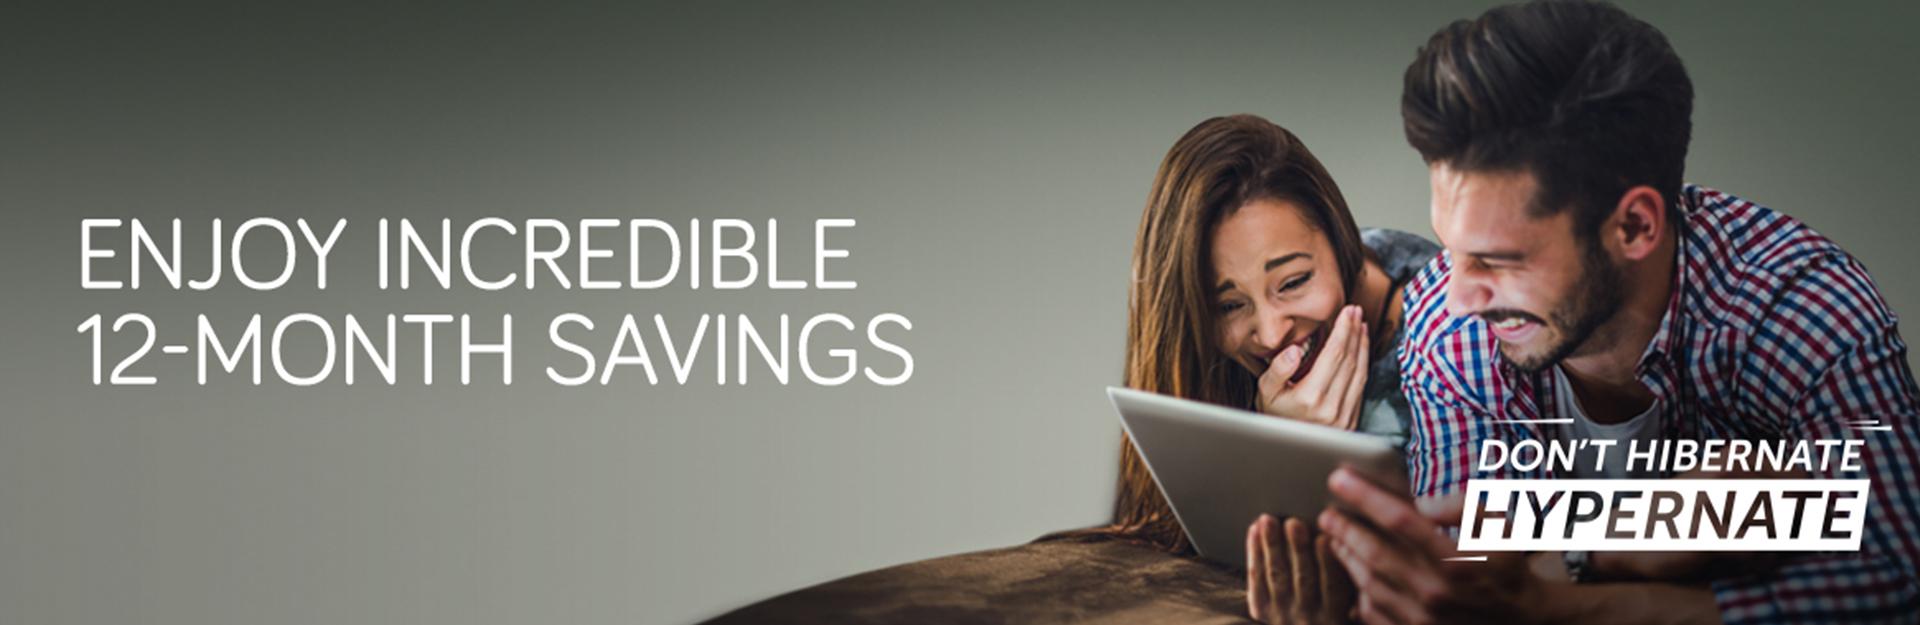 12 Month Savings - Fibre Broadband and Phone - Hyperoptic